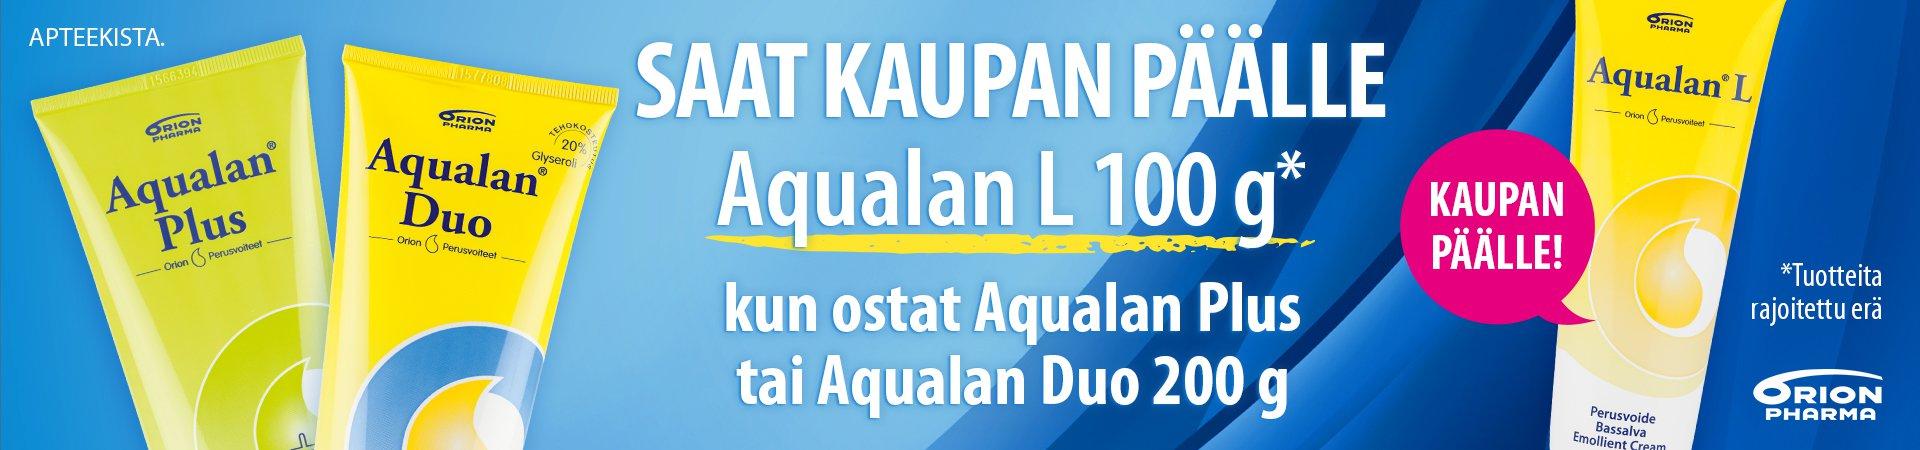 Aqualan tarjous